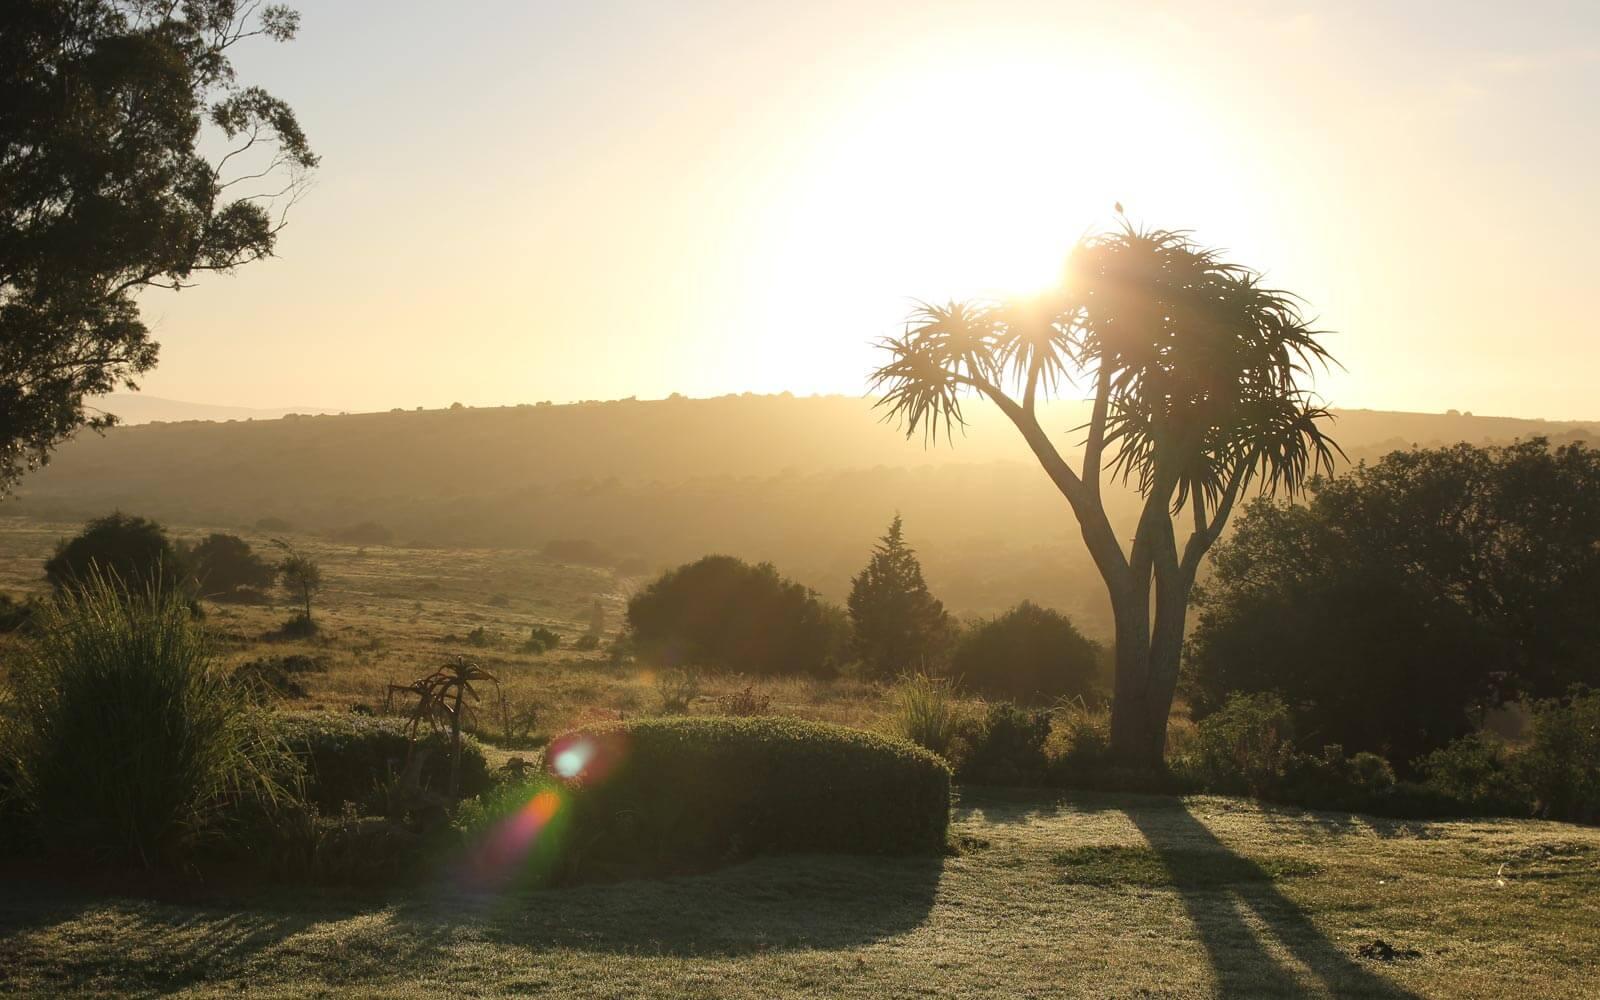 Sonnenaufgang in Südafrika